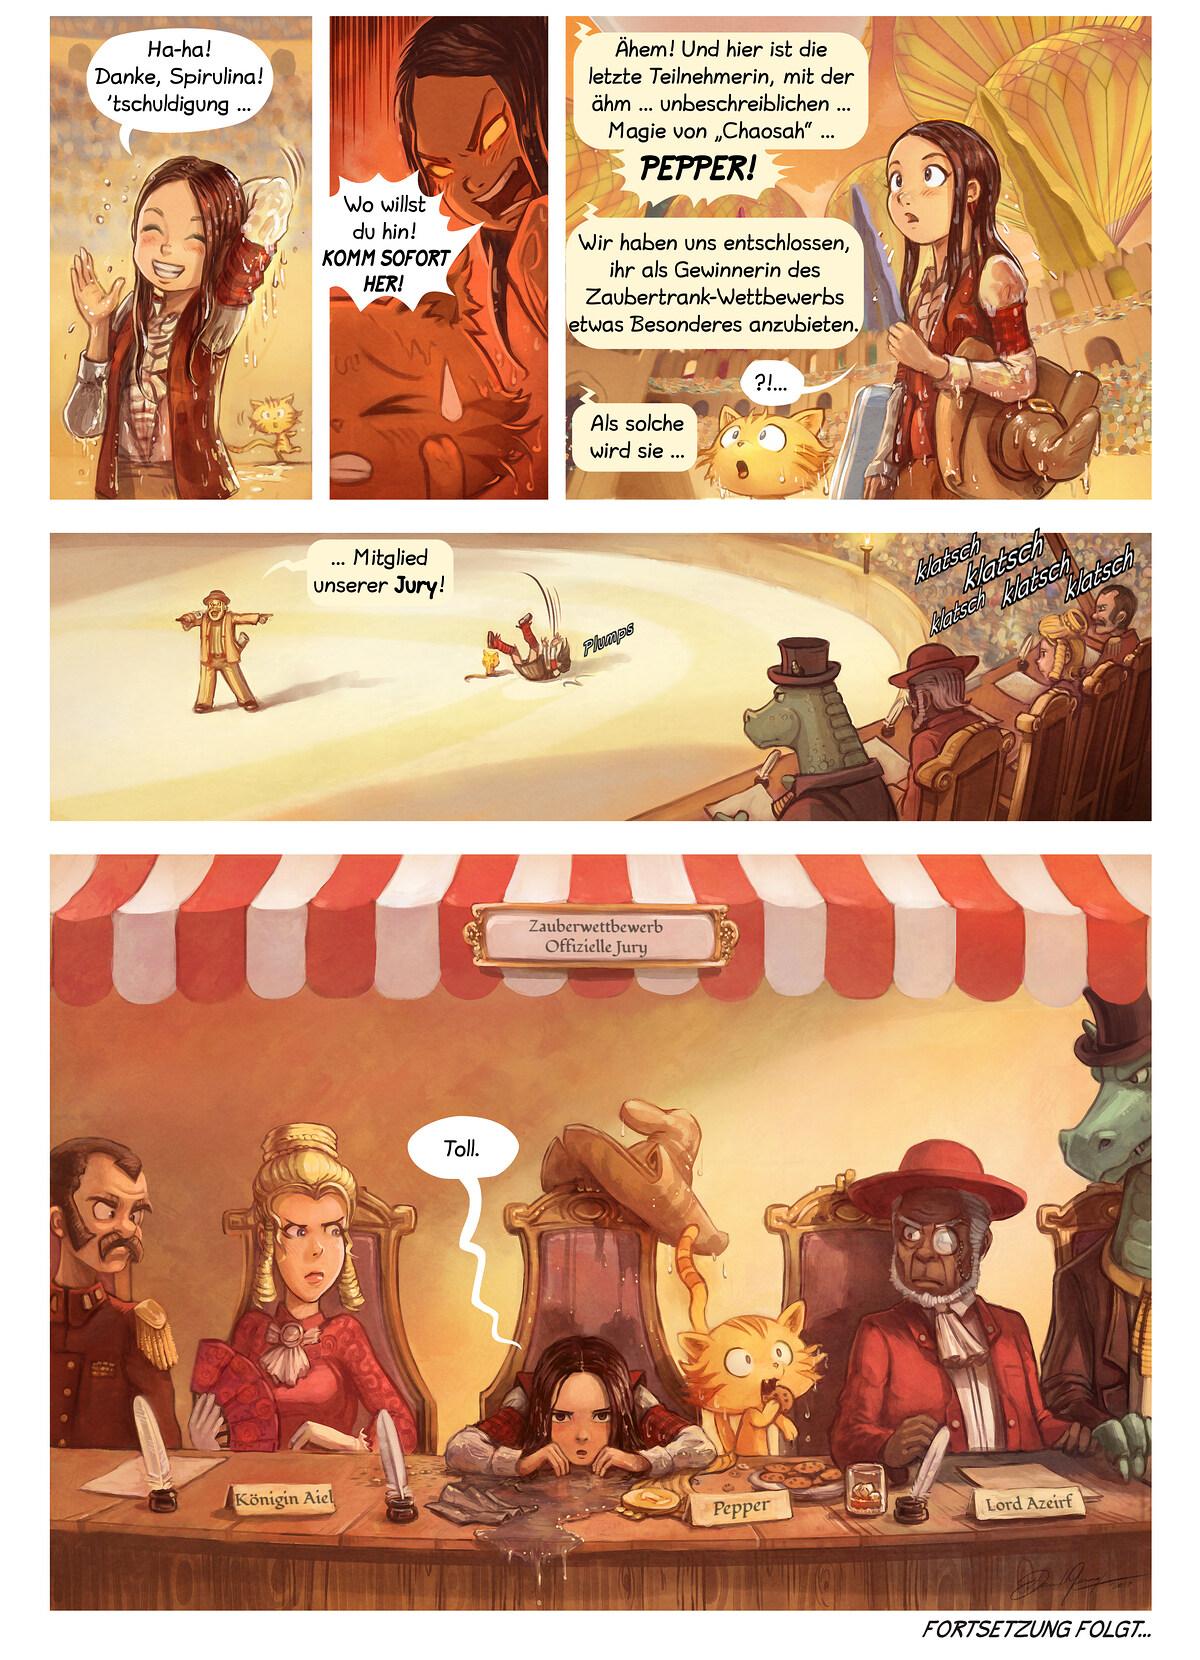 Episode 21: The Magic Contest - Pepper&Carrot